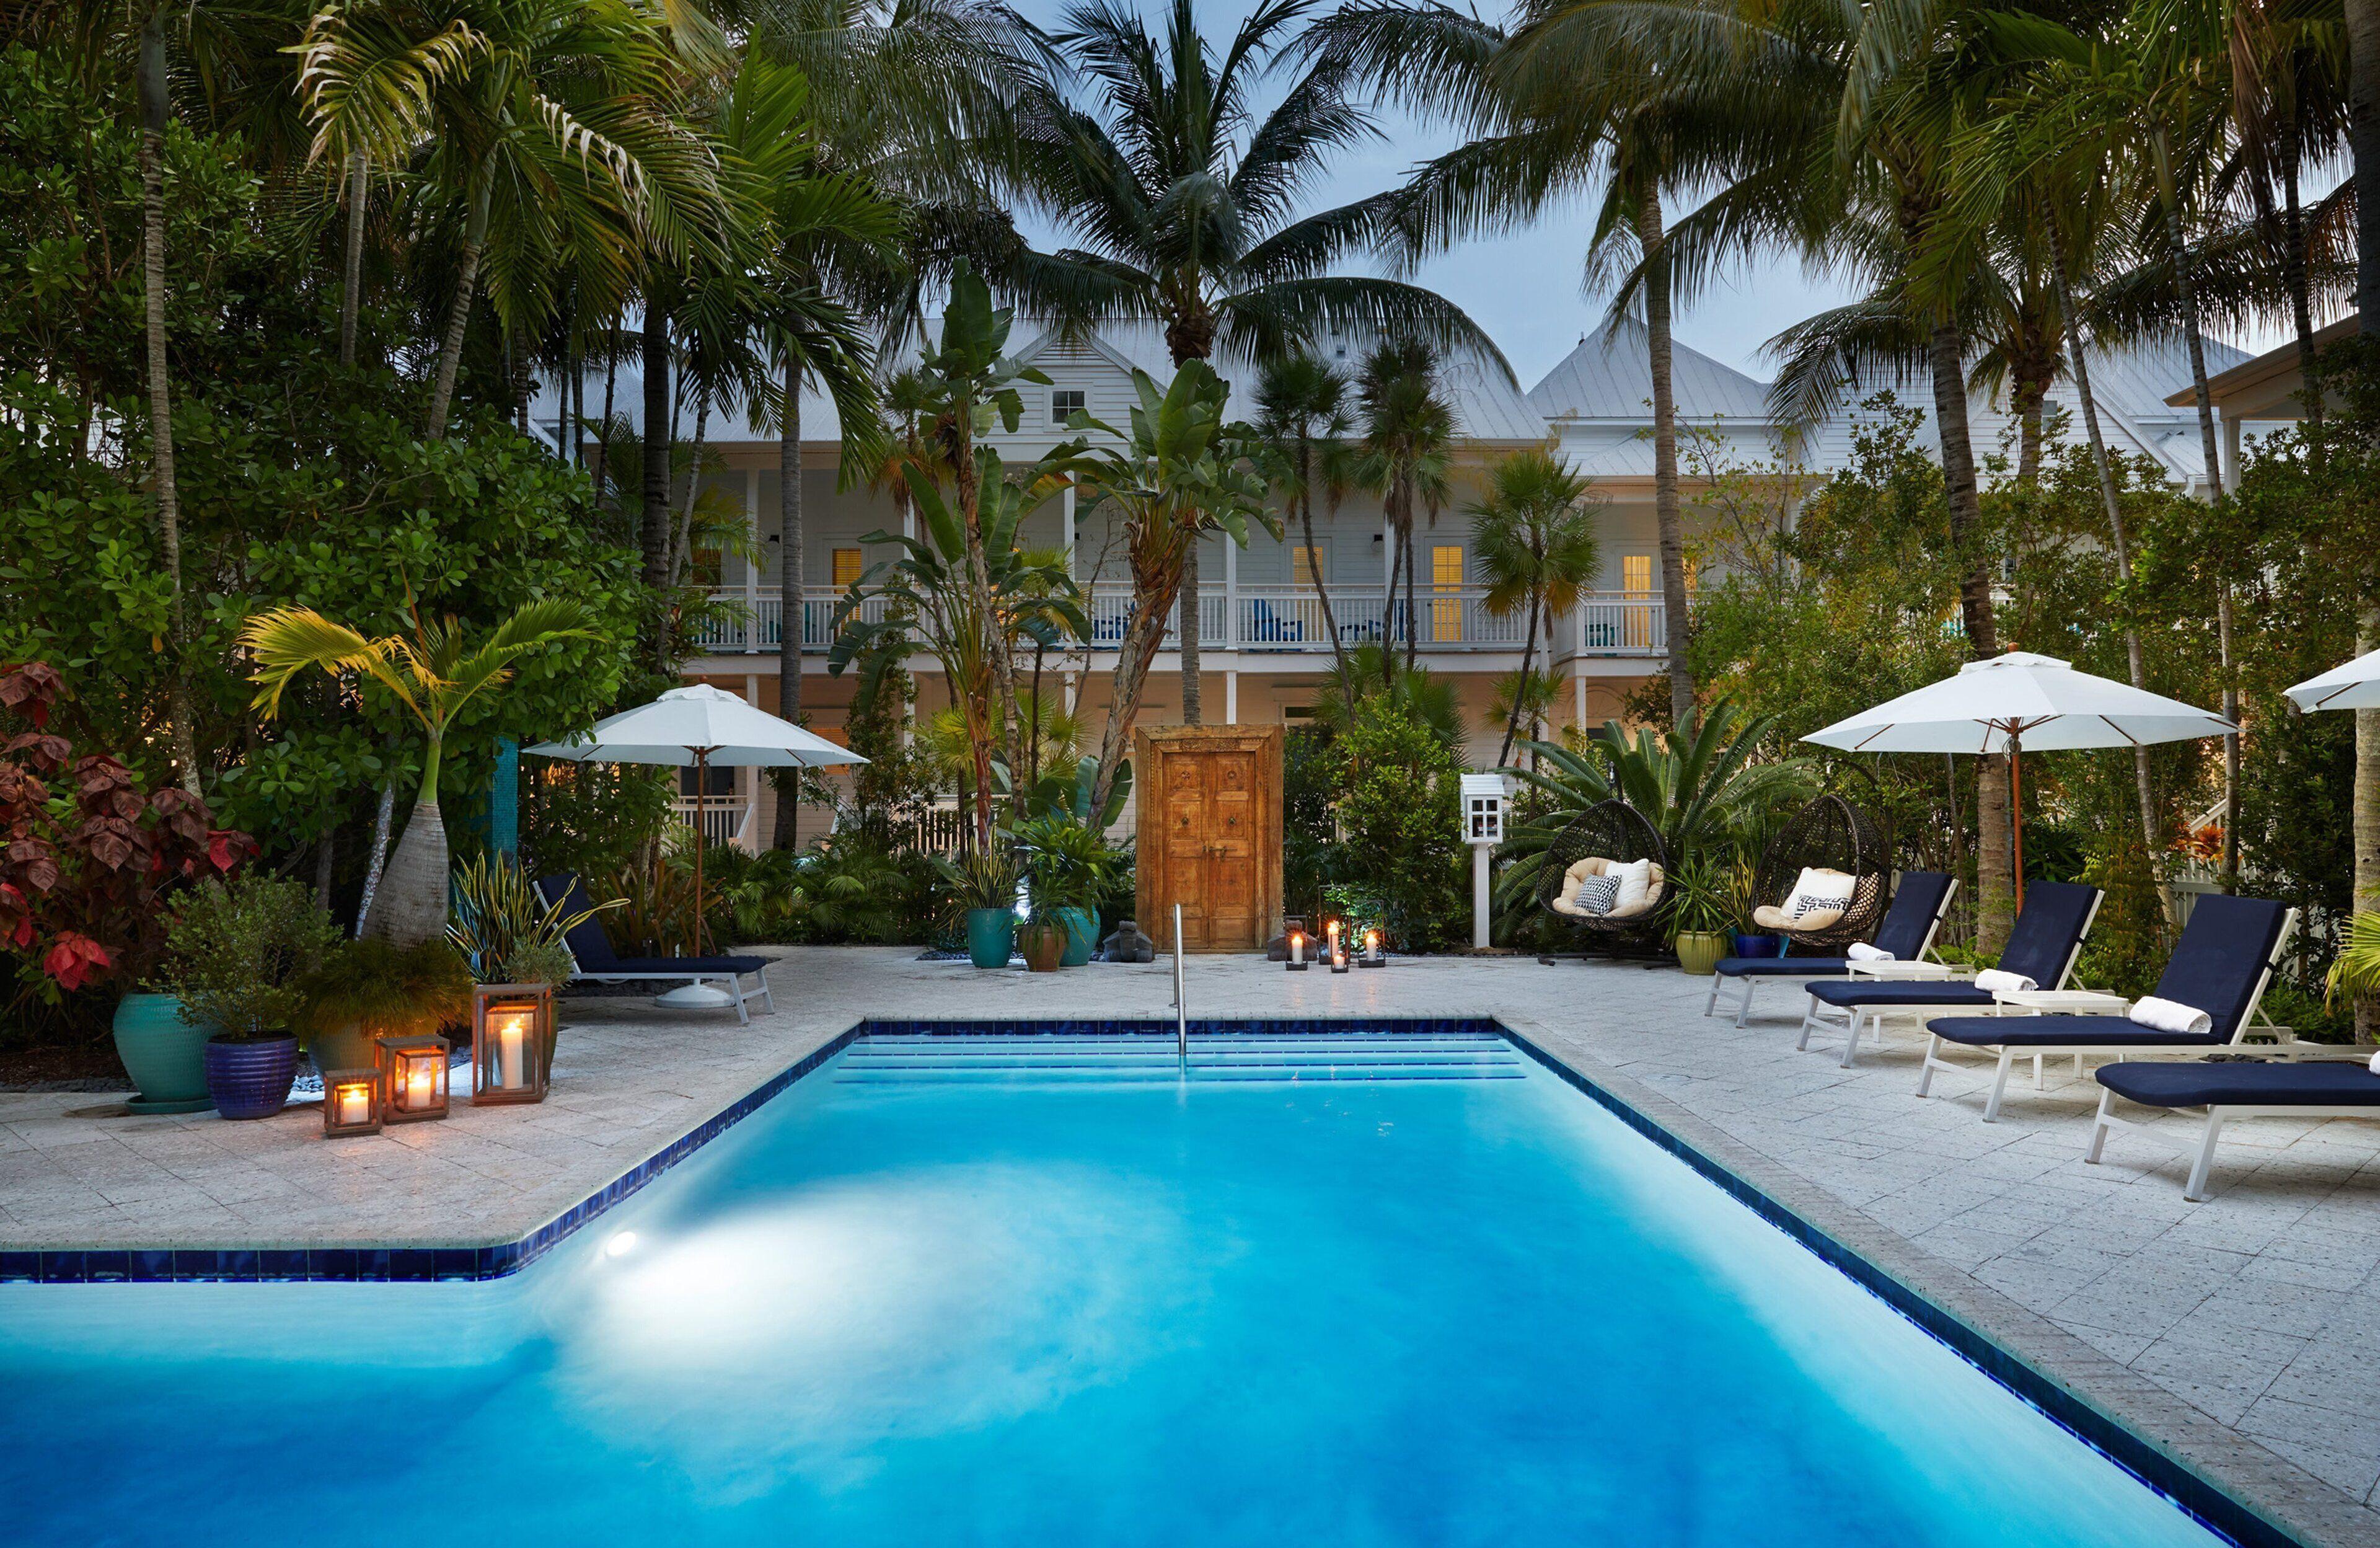 Courtesy of Parrot Key Hotel and Villas / Expedia